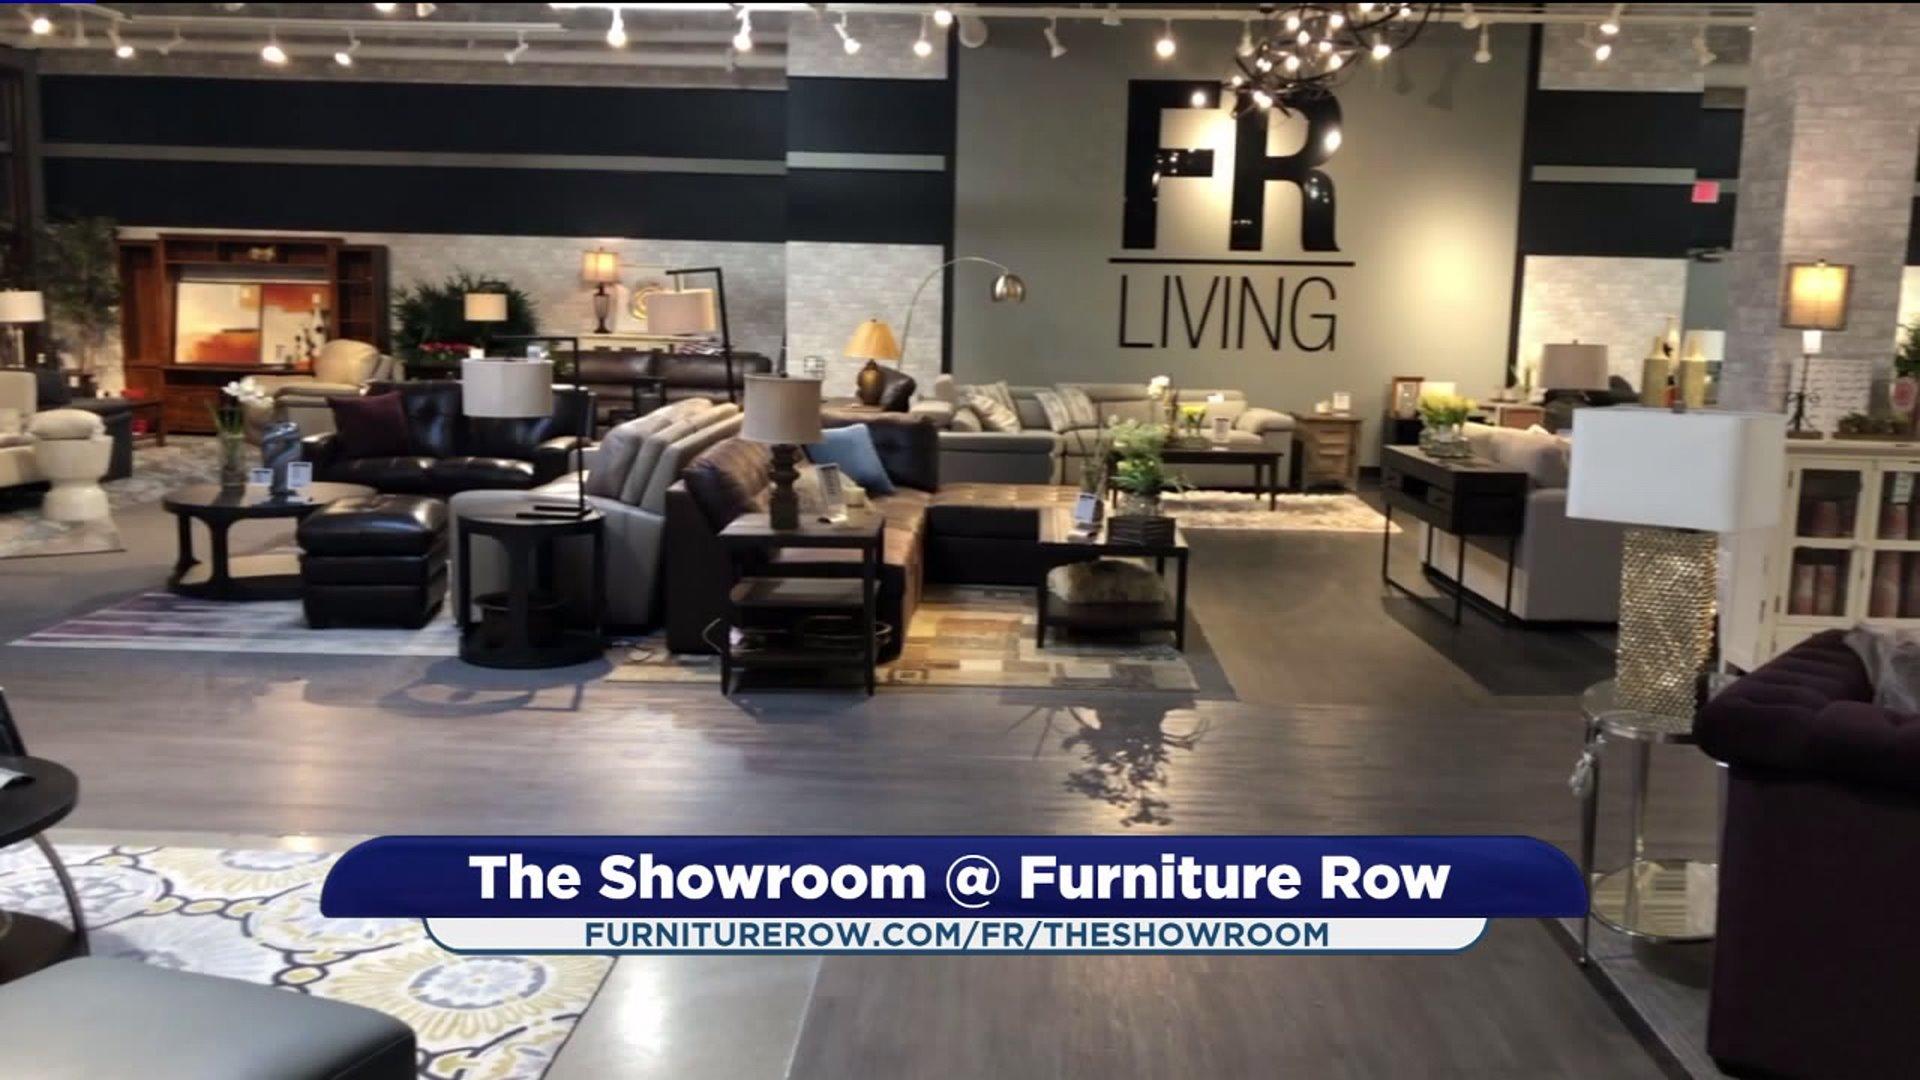 The Showroom At Furniture Row Huge Sale Memorial Day Weekend Fox31 Denver